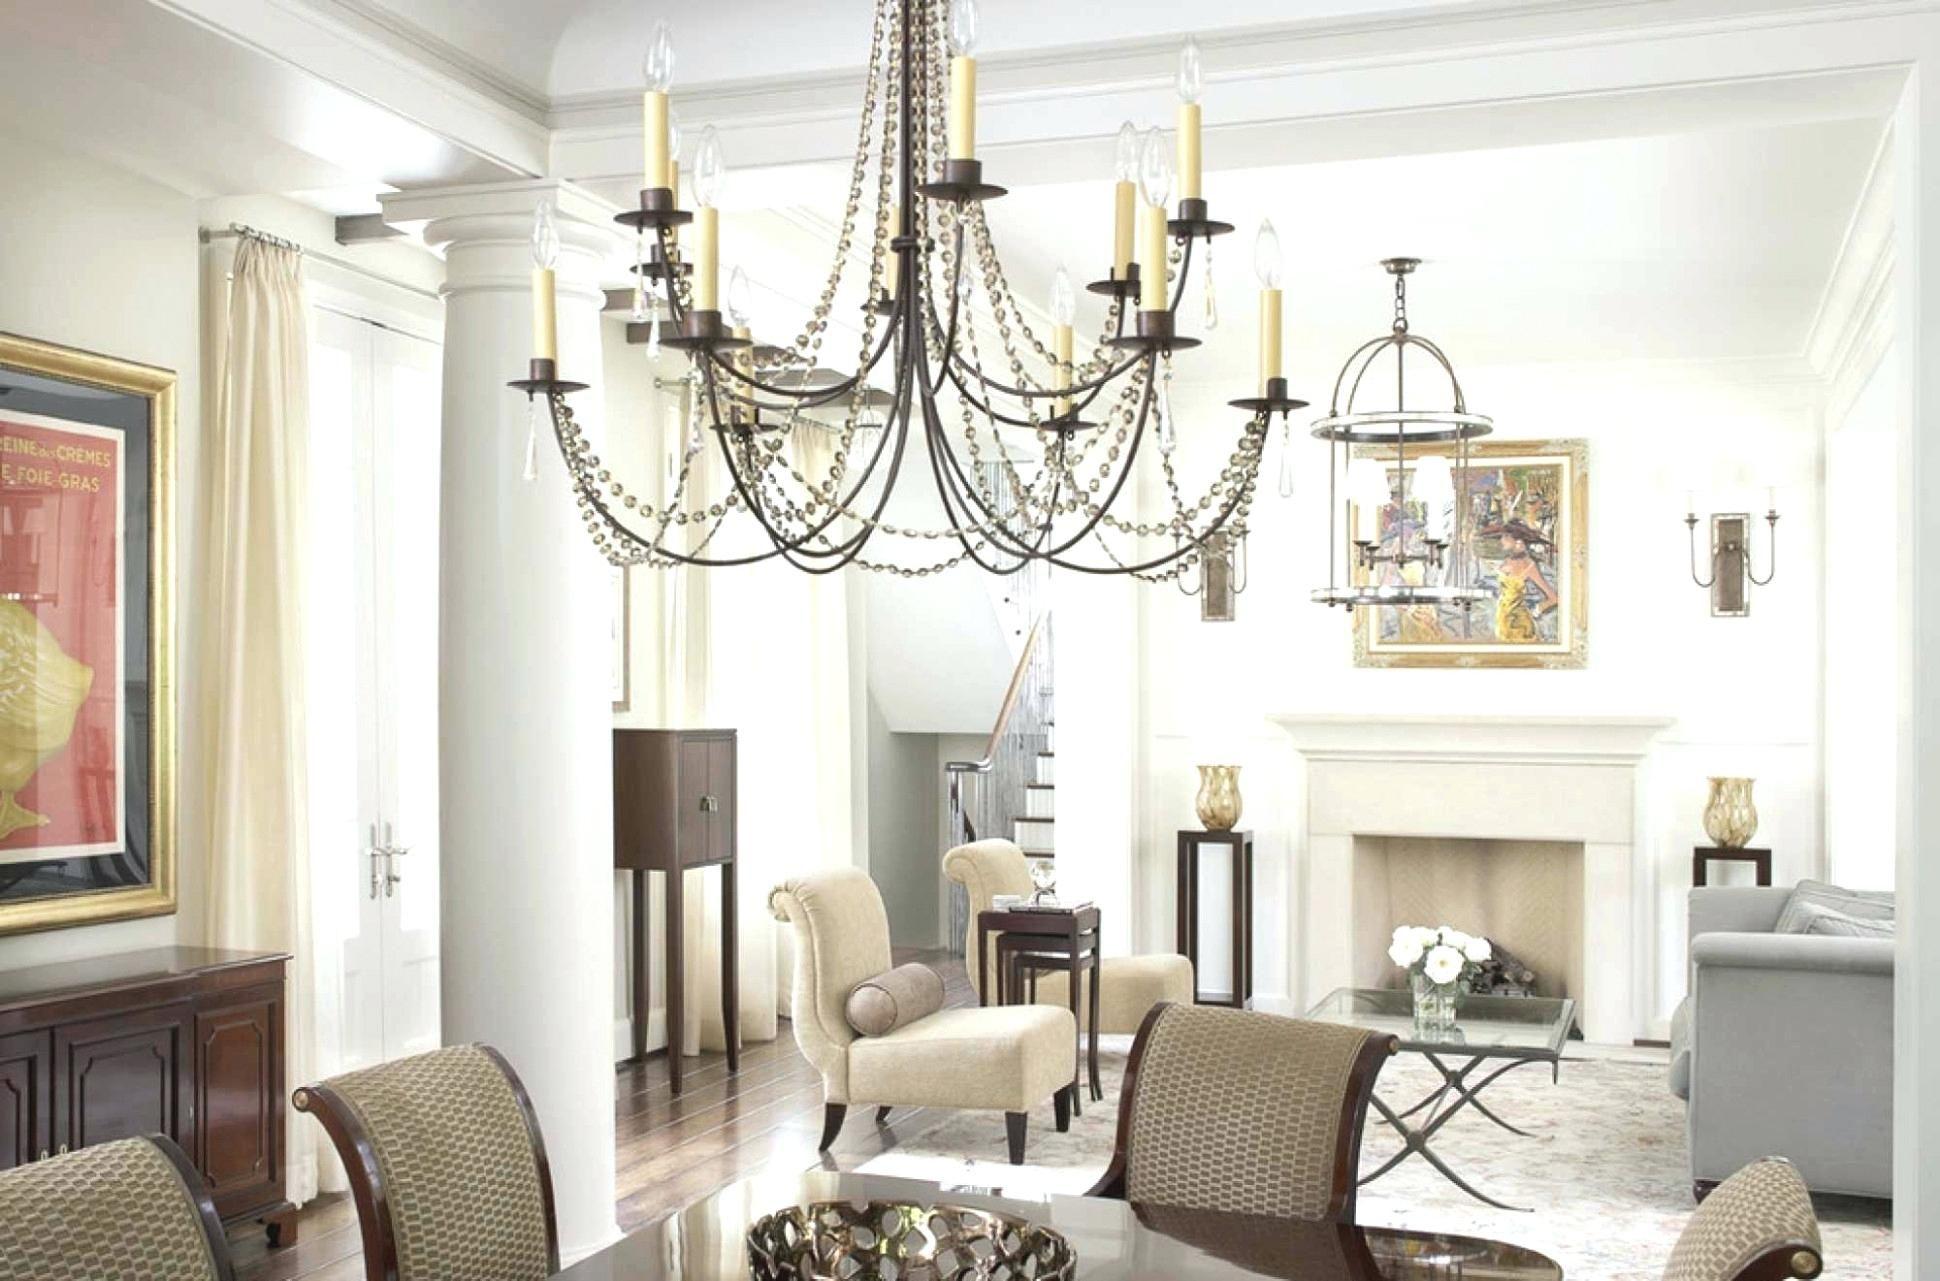 Stunning Large Dining Room Chandeliers Design Chandelier In